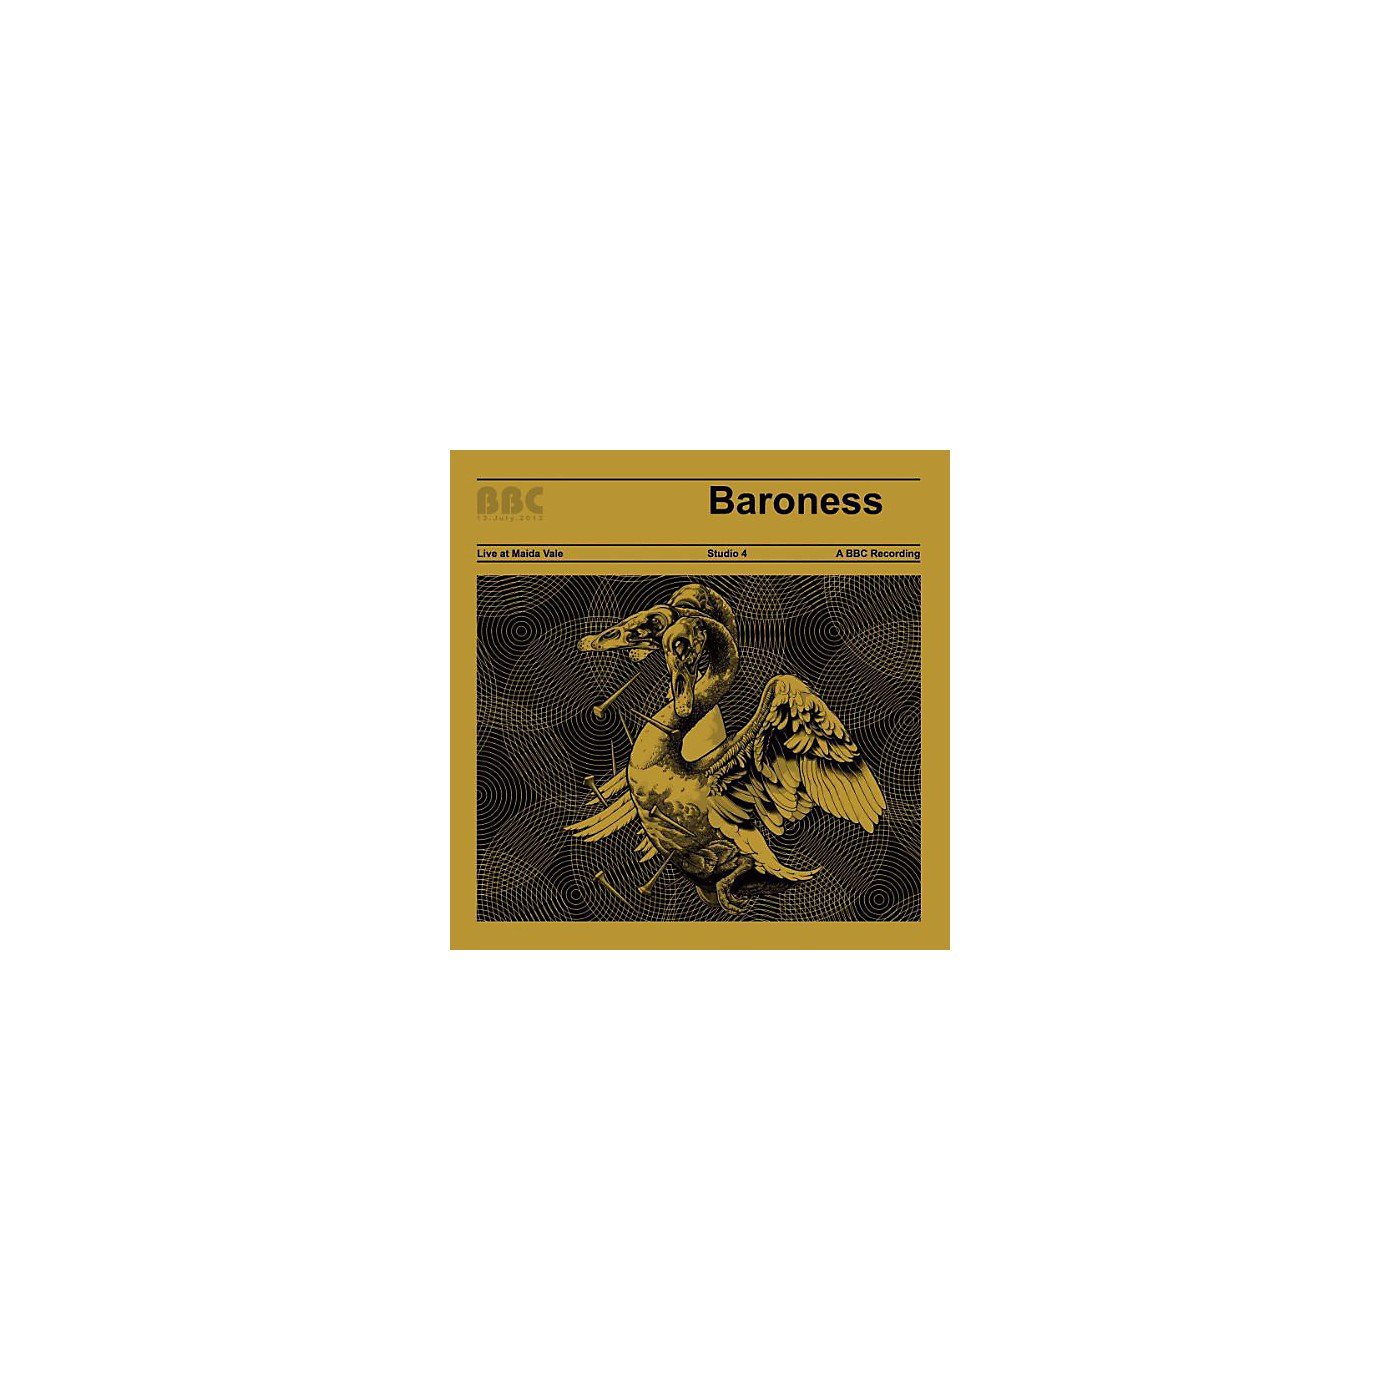 Alliance Baroness - Live at Maida Vale: BBC thumbnail